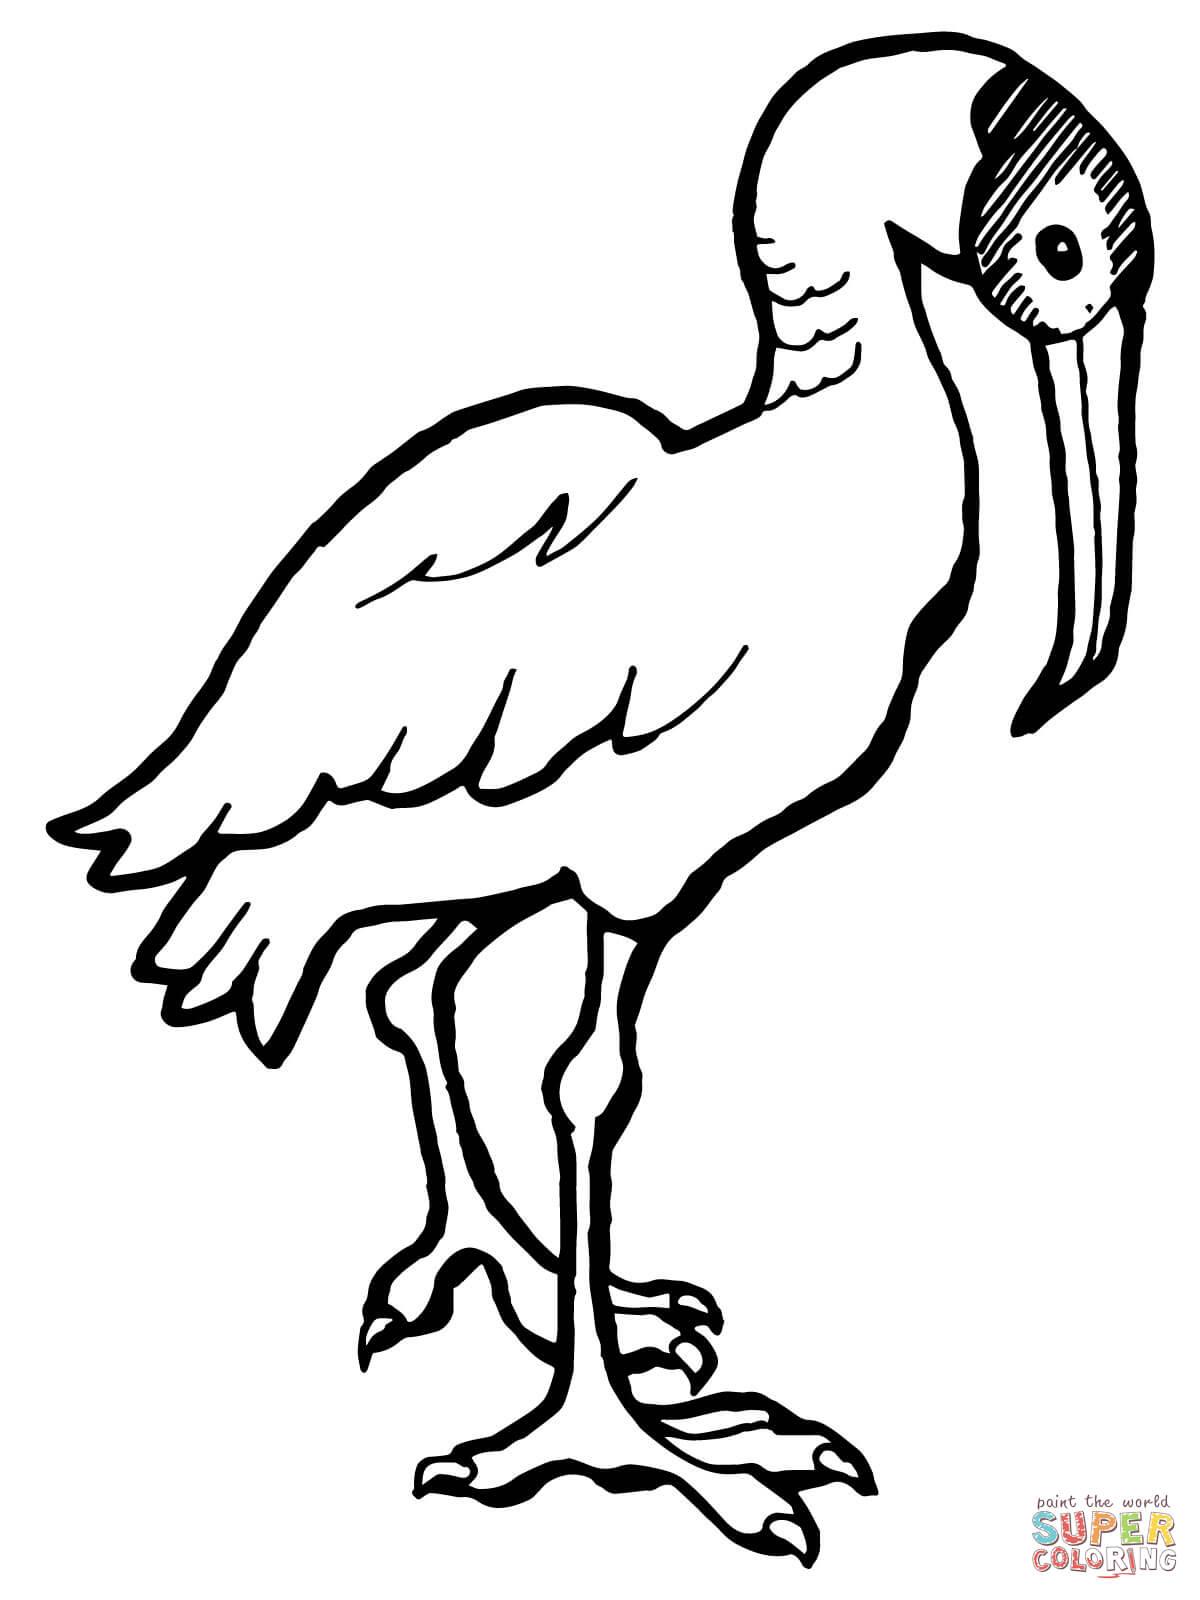 Scarlet Ibis coloring #7, Download drawings